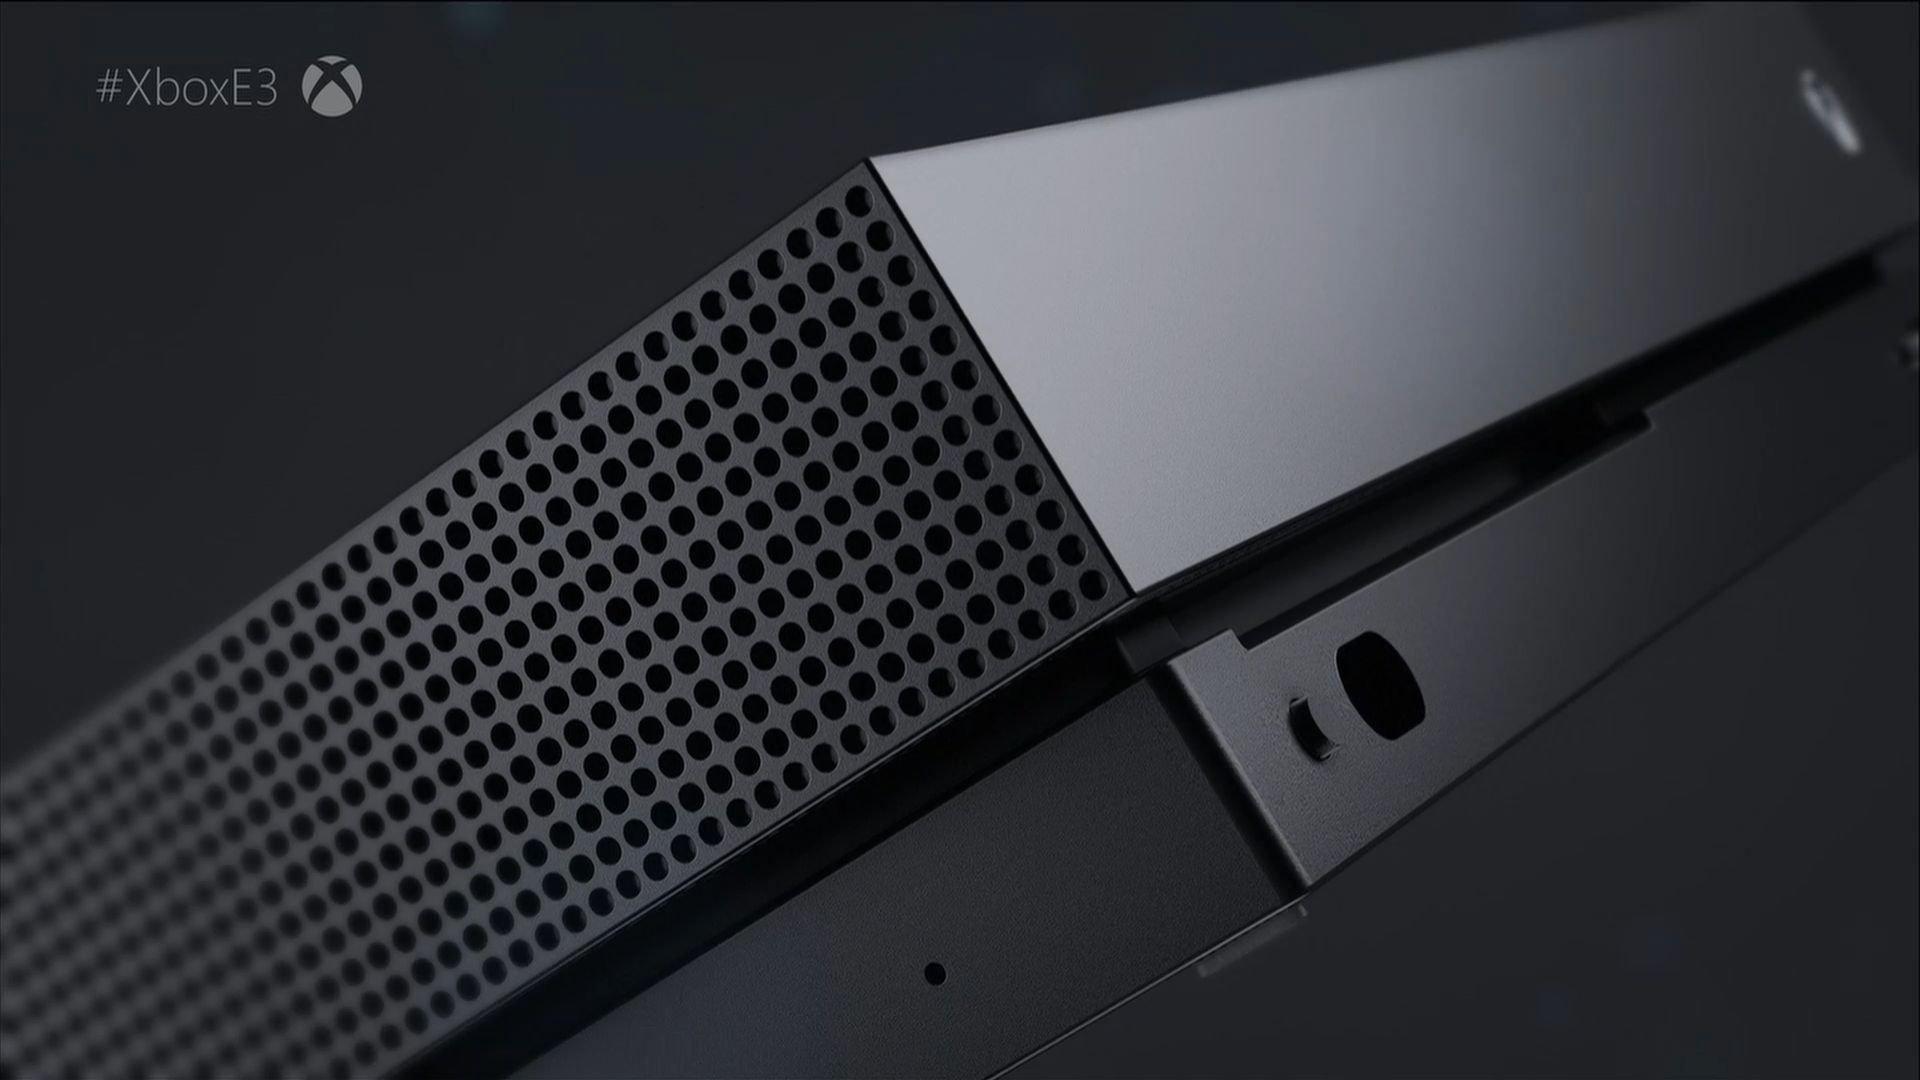 Xbox One X Ultra HD 4K